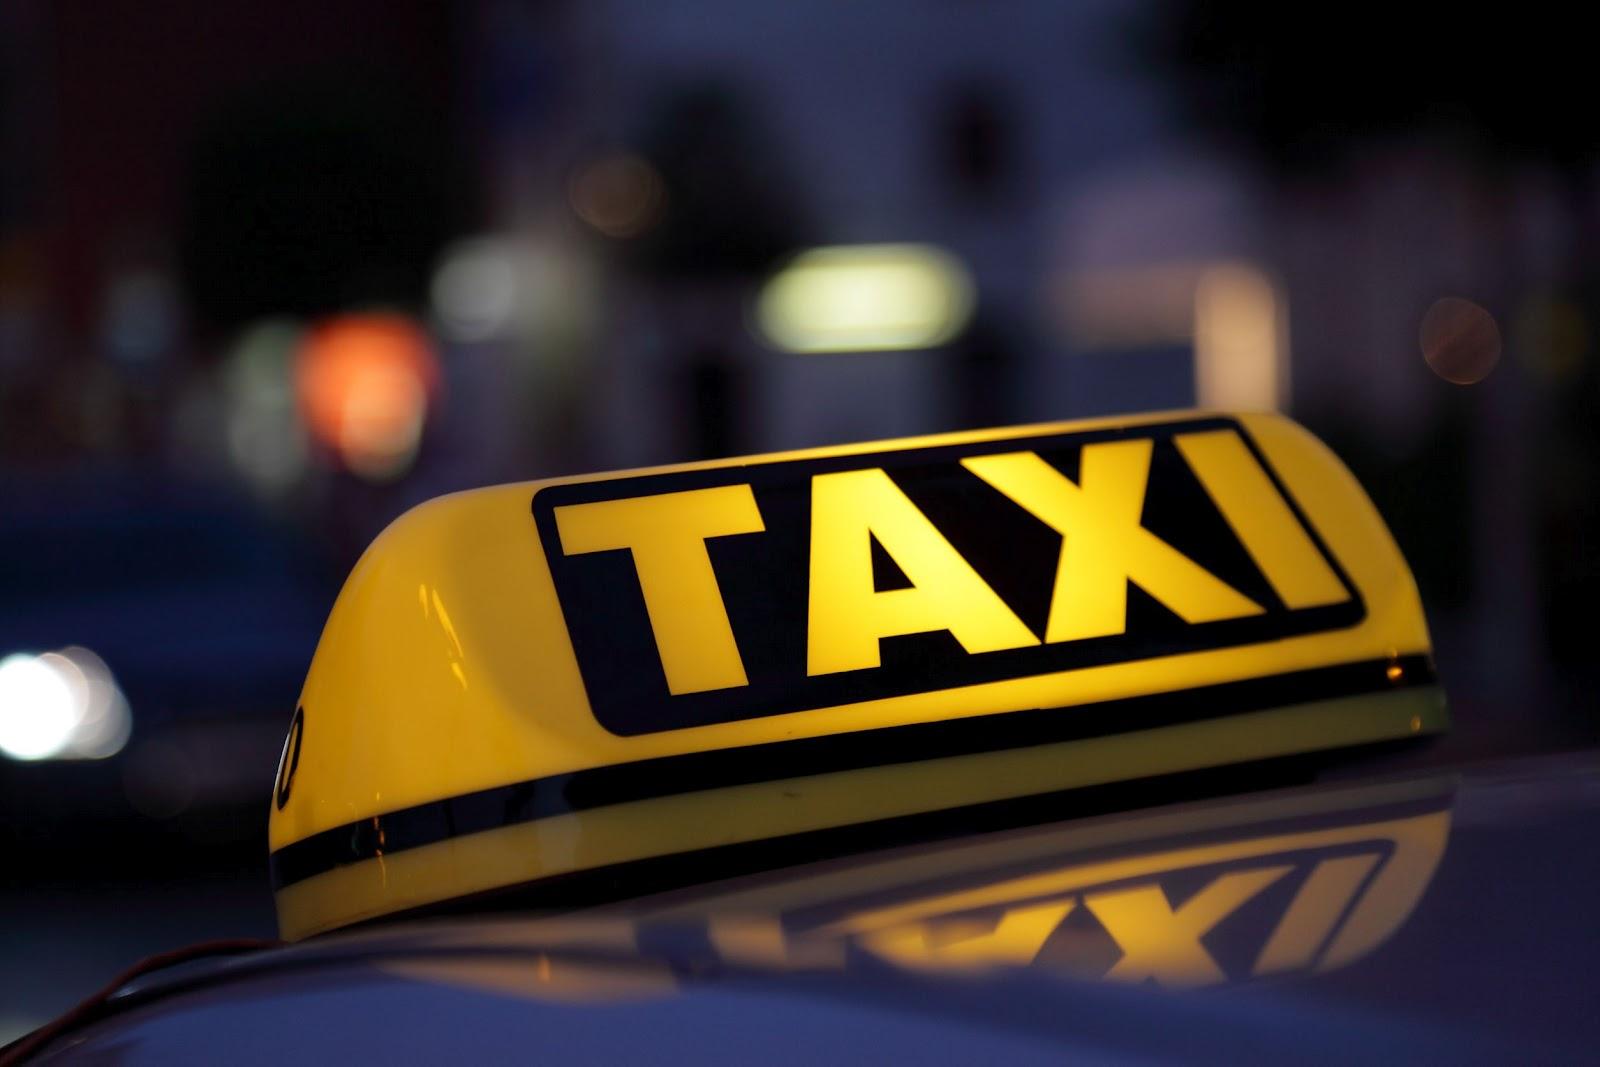 Продавец избил таксиста в Харькове